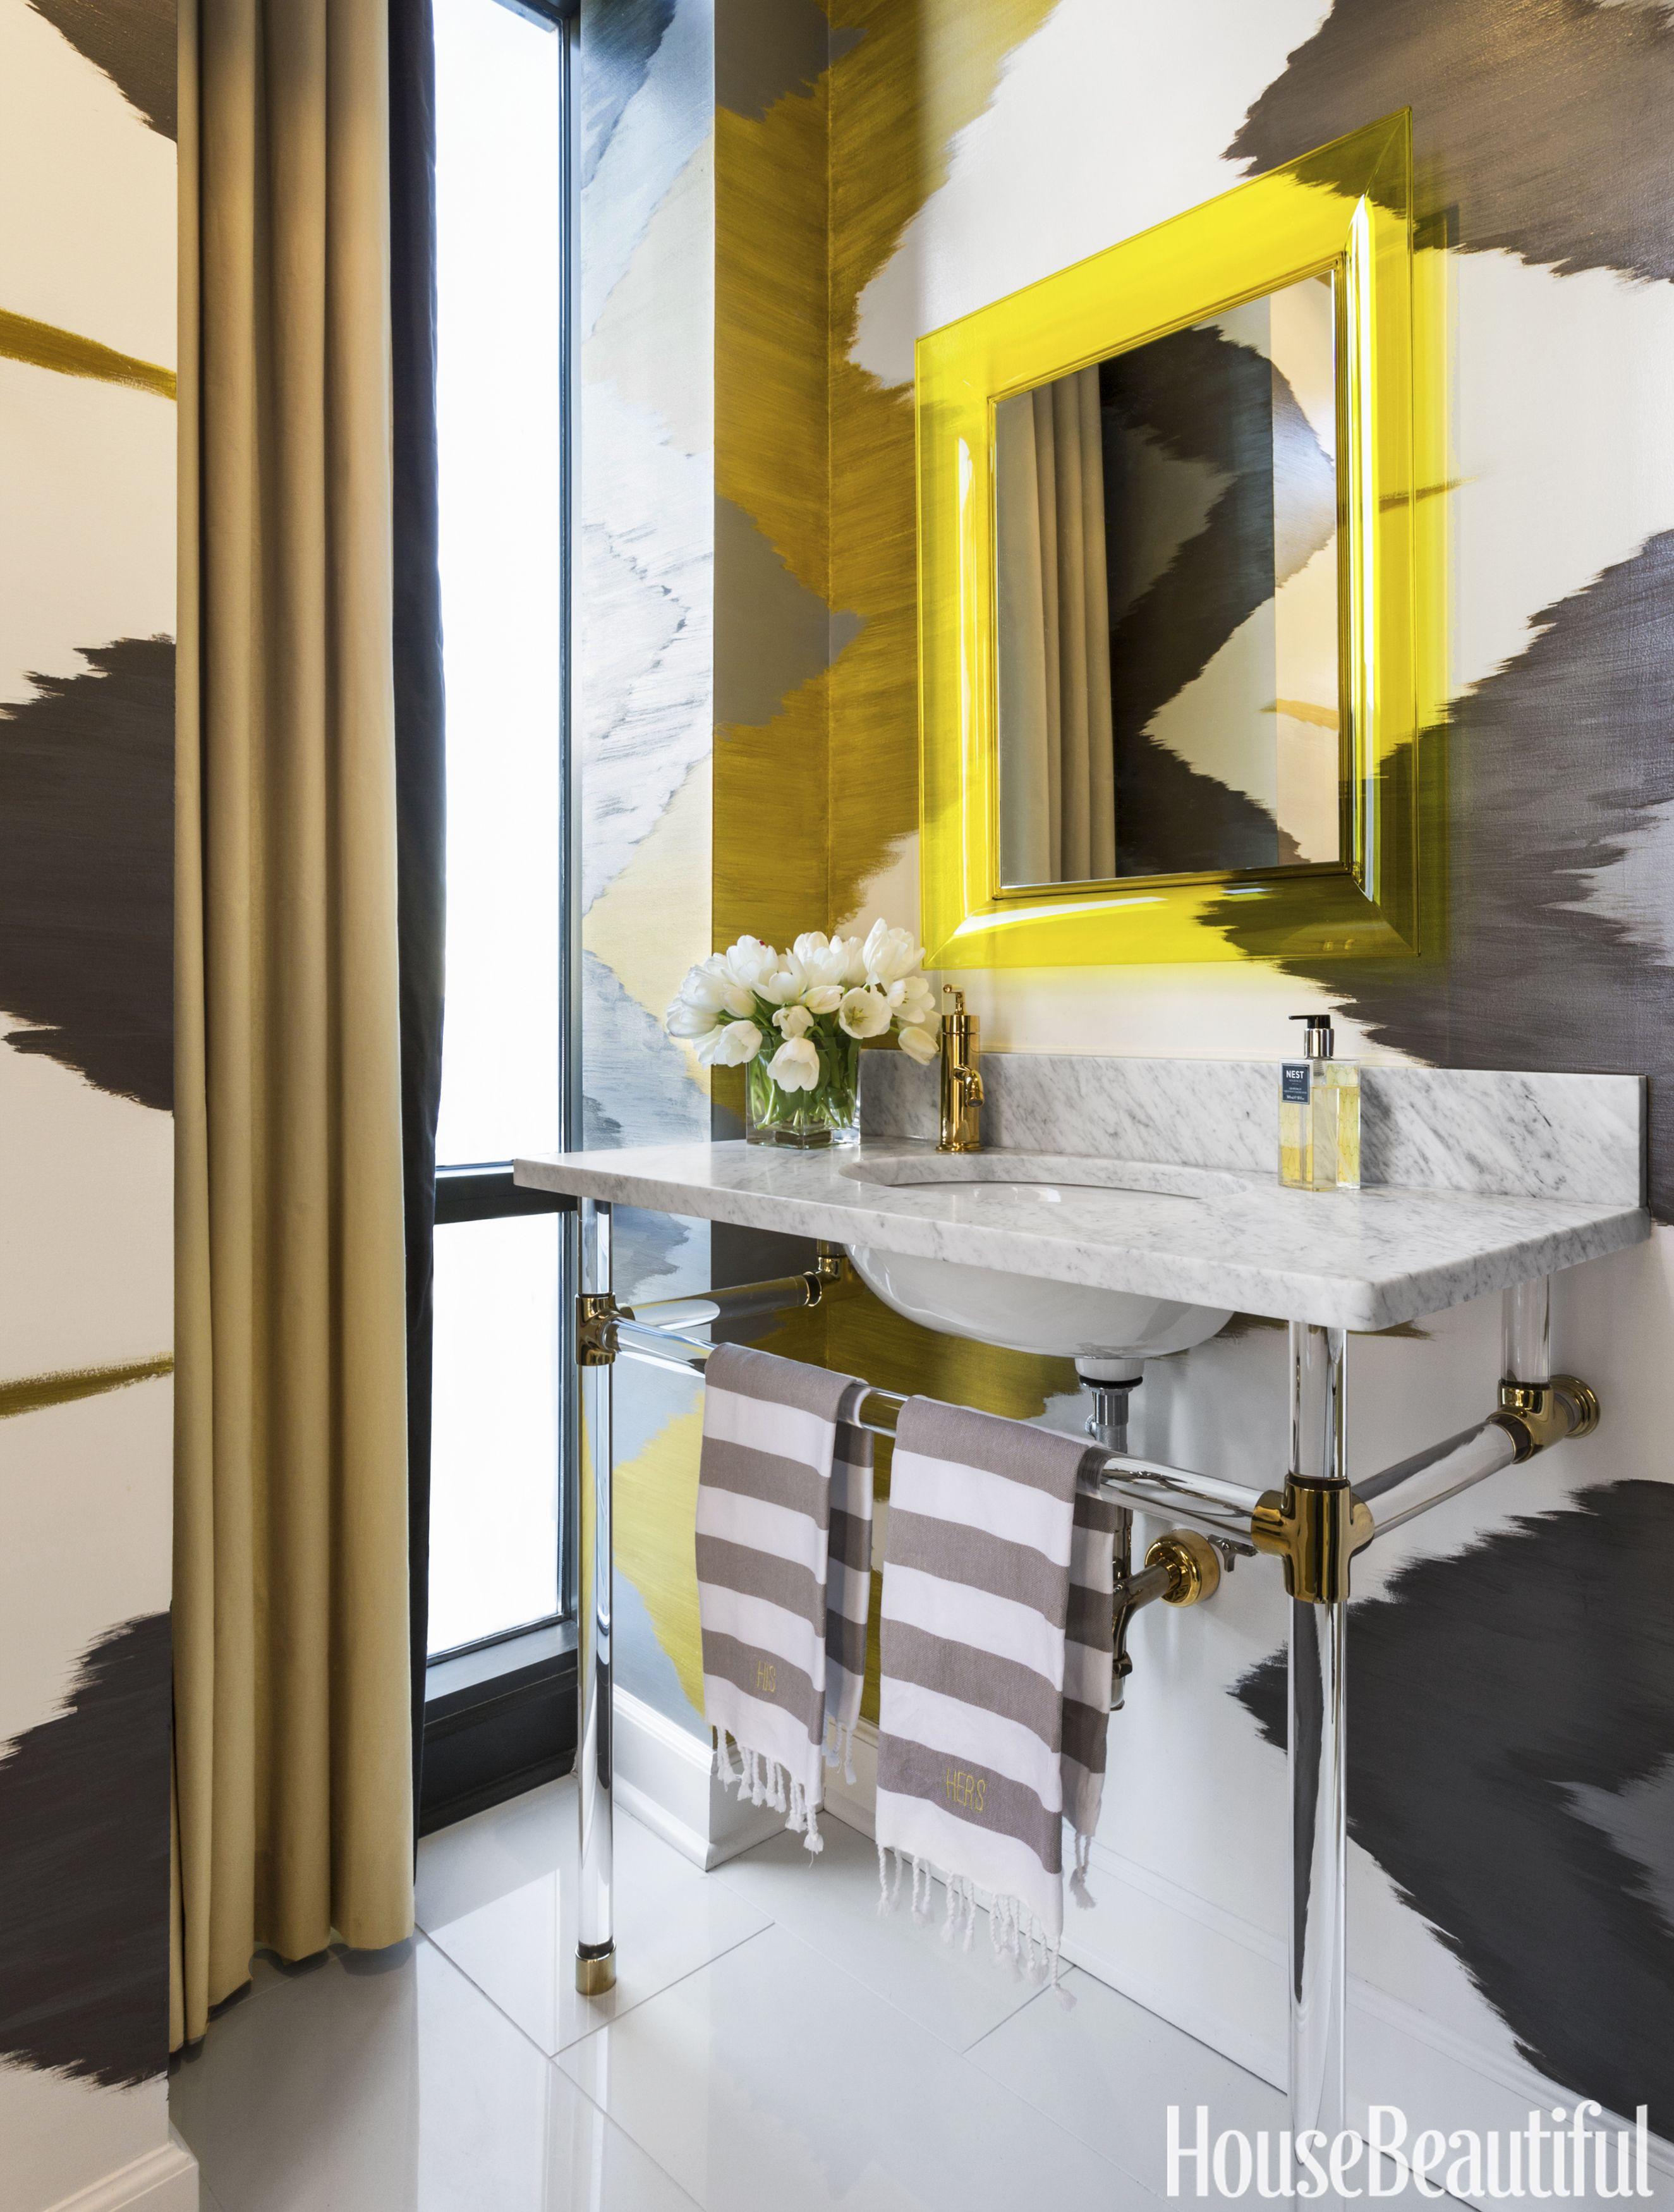 Powder Room Decorating Ideas Powder Room Design and